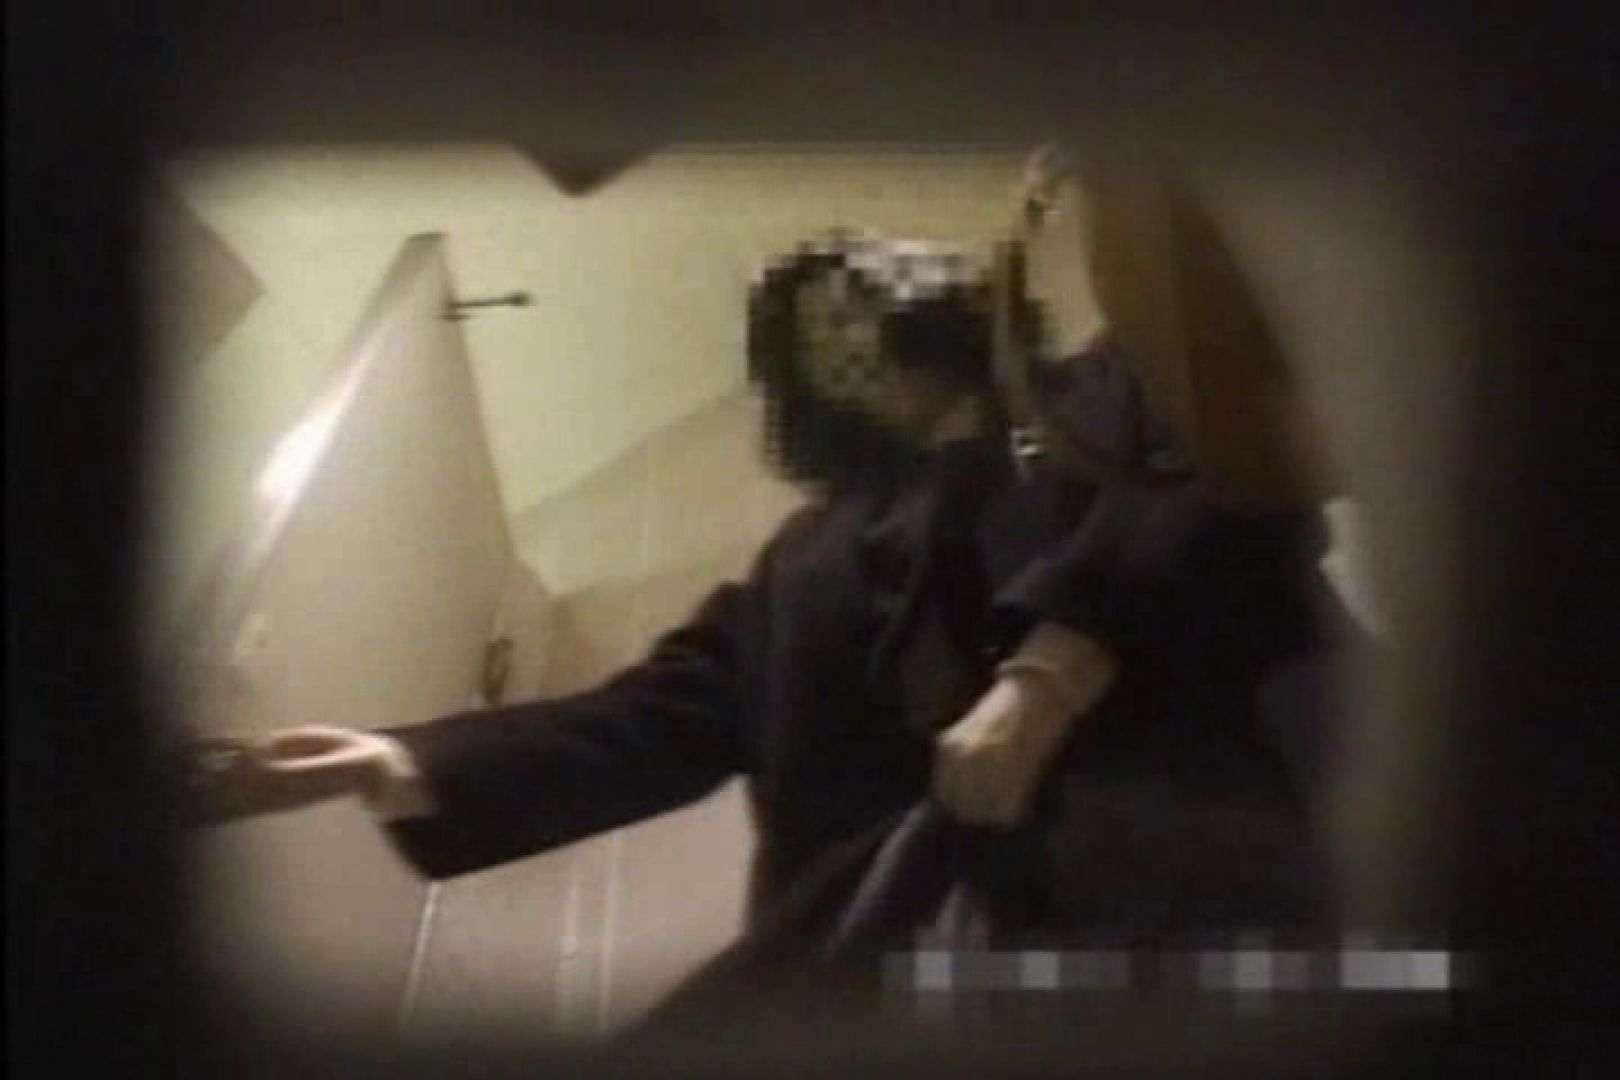 STY-013 実録!2カメde女子洗面所 洗面所 濡れ場動画紹介 90連発 86